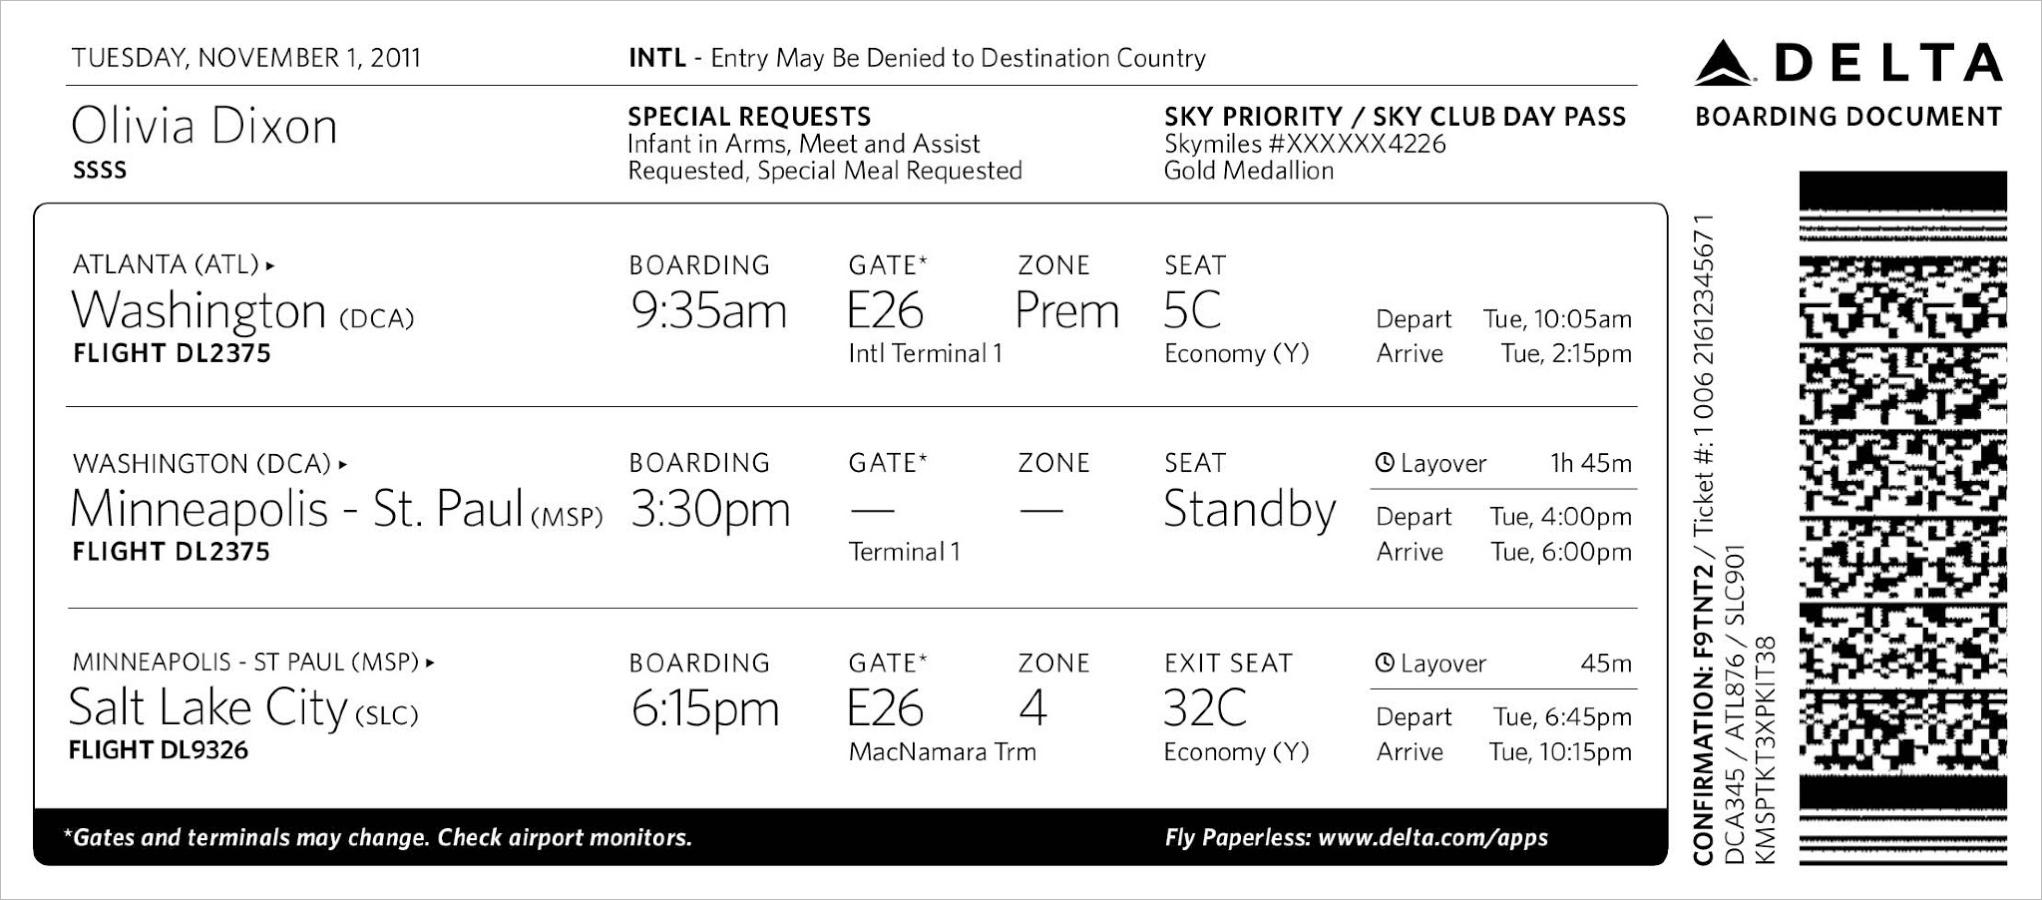 DL_boardingPass_kt233_o.png